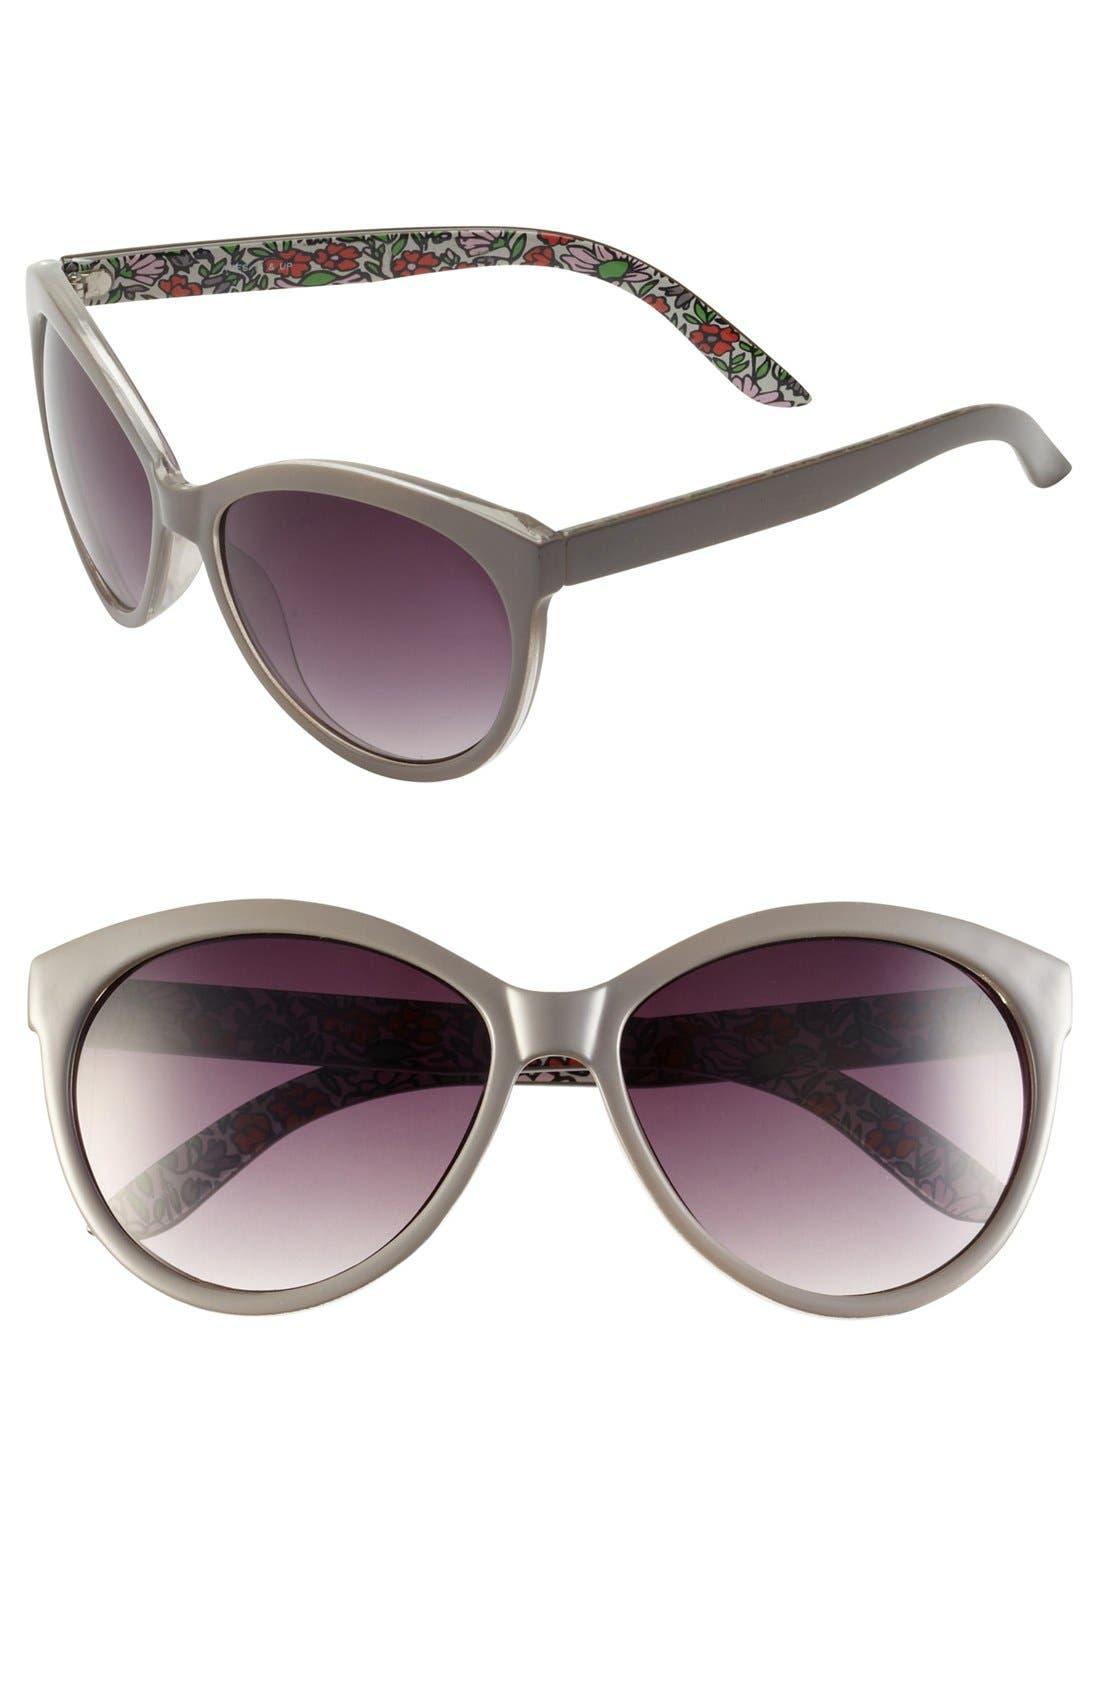 Alternate Image 1 Selected - FE NY Cat's Eye Sunglasses